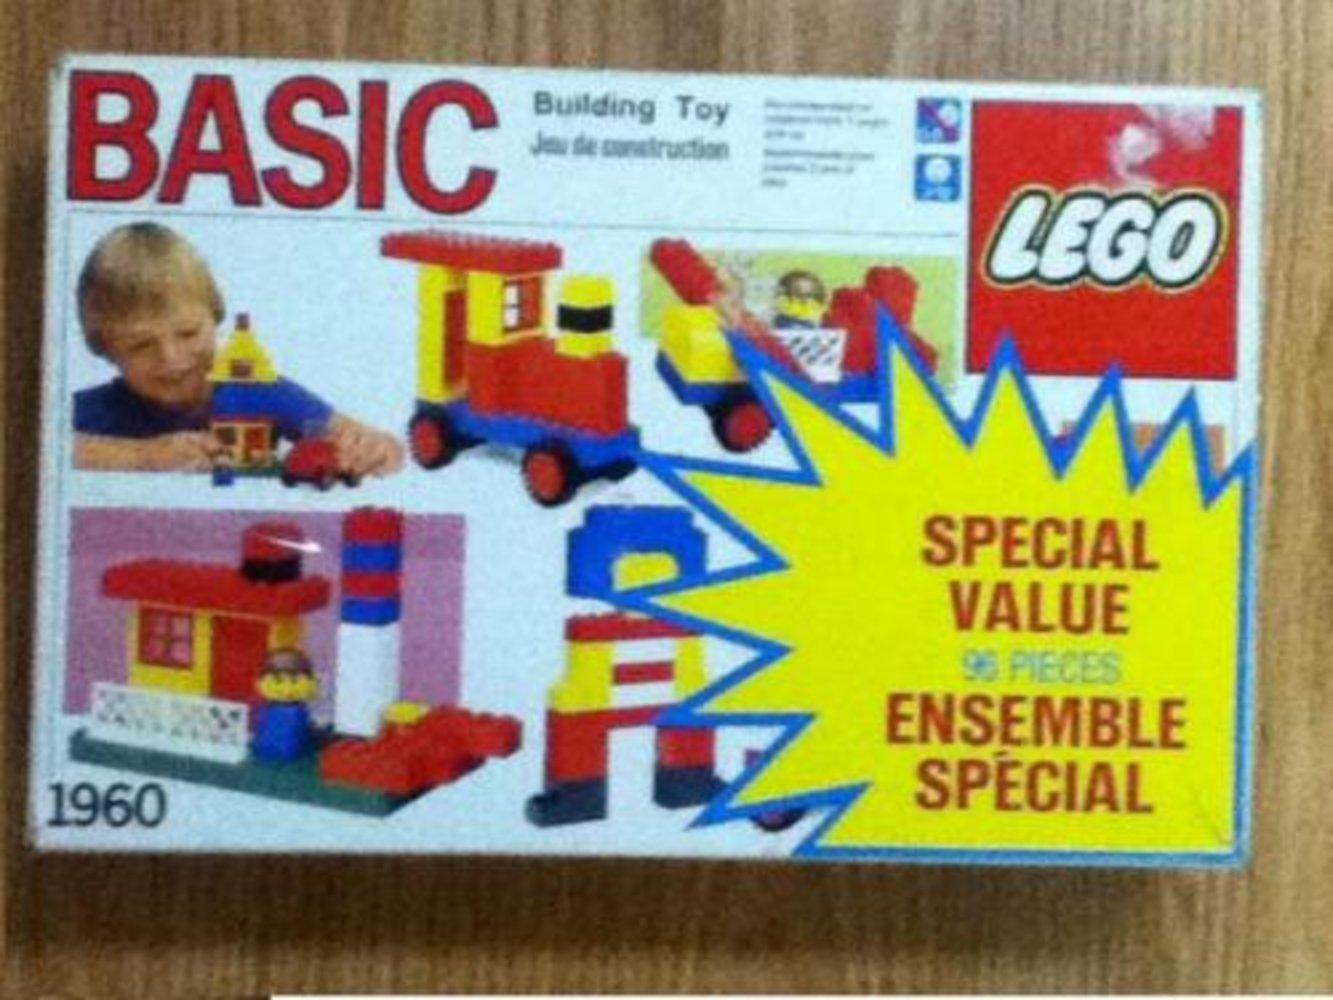 Special Value 96 pieces (Canadian Set)